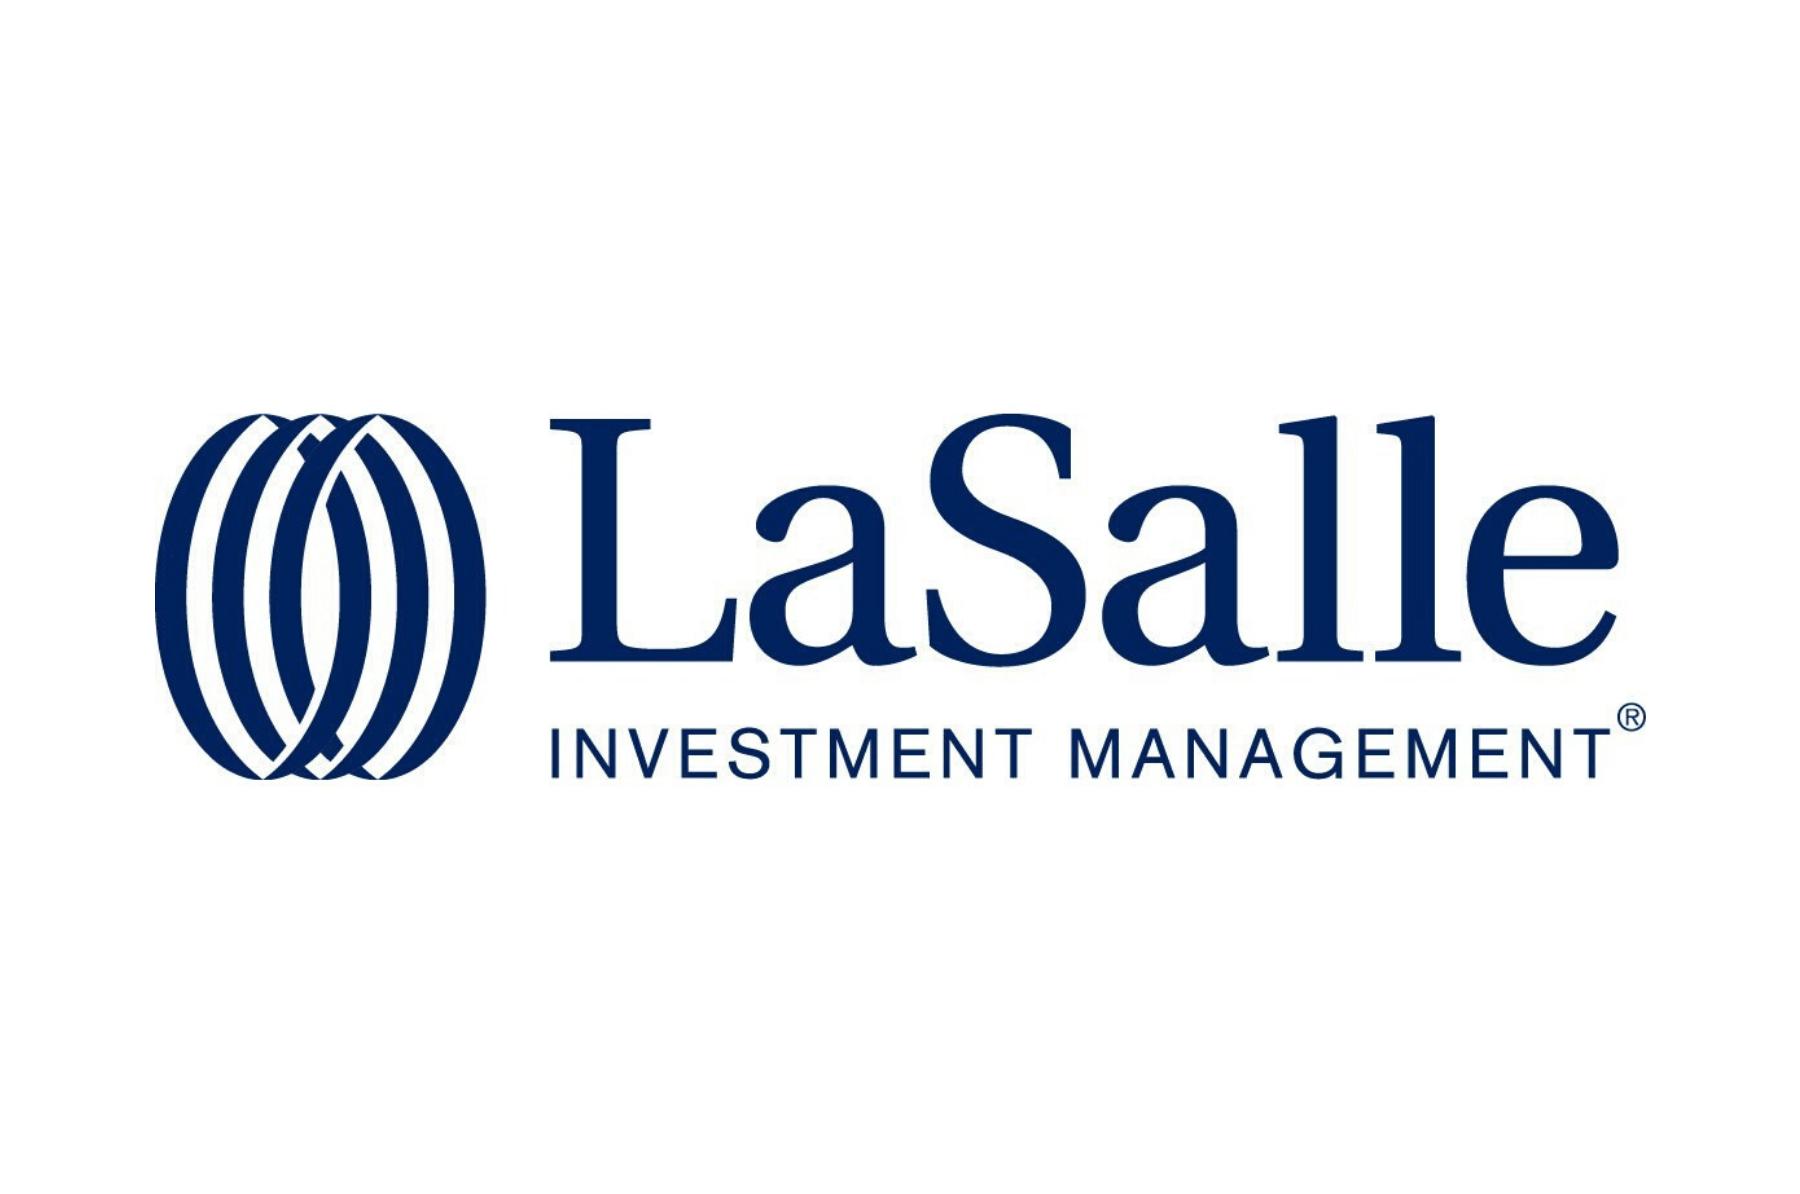 New Client: Lasalle Investment Management - Phoenix American Financial Services, Inc